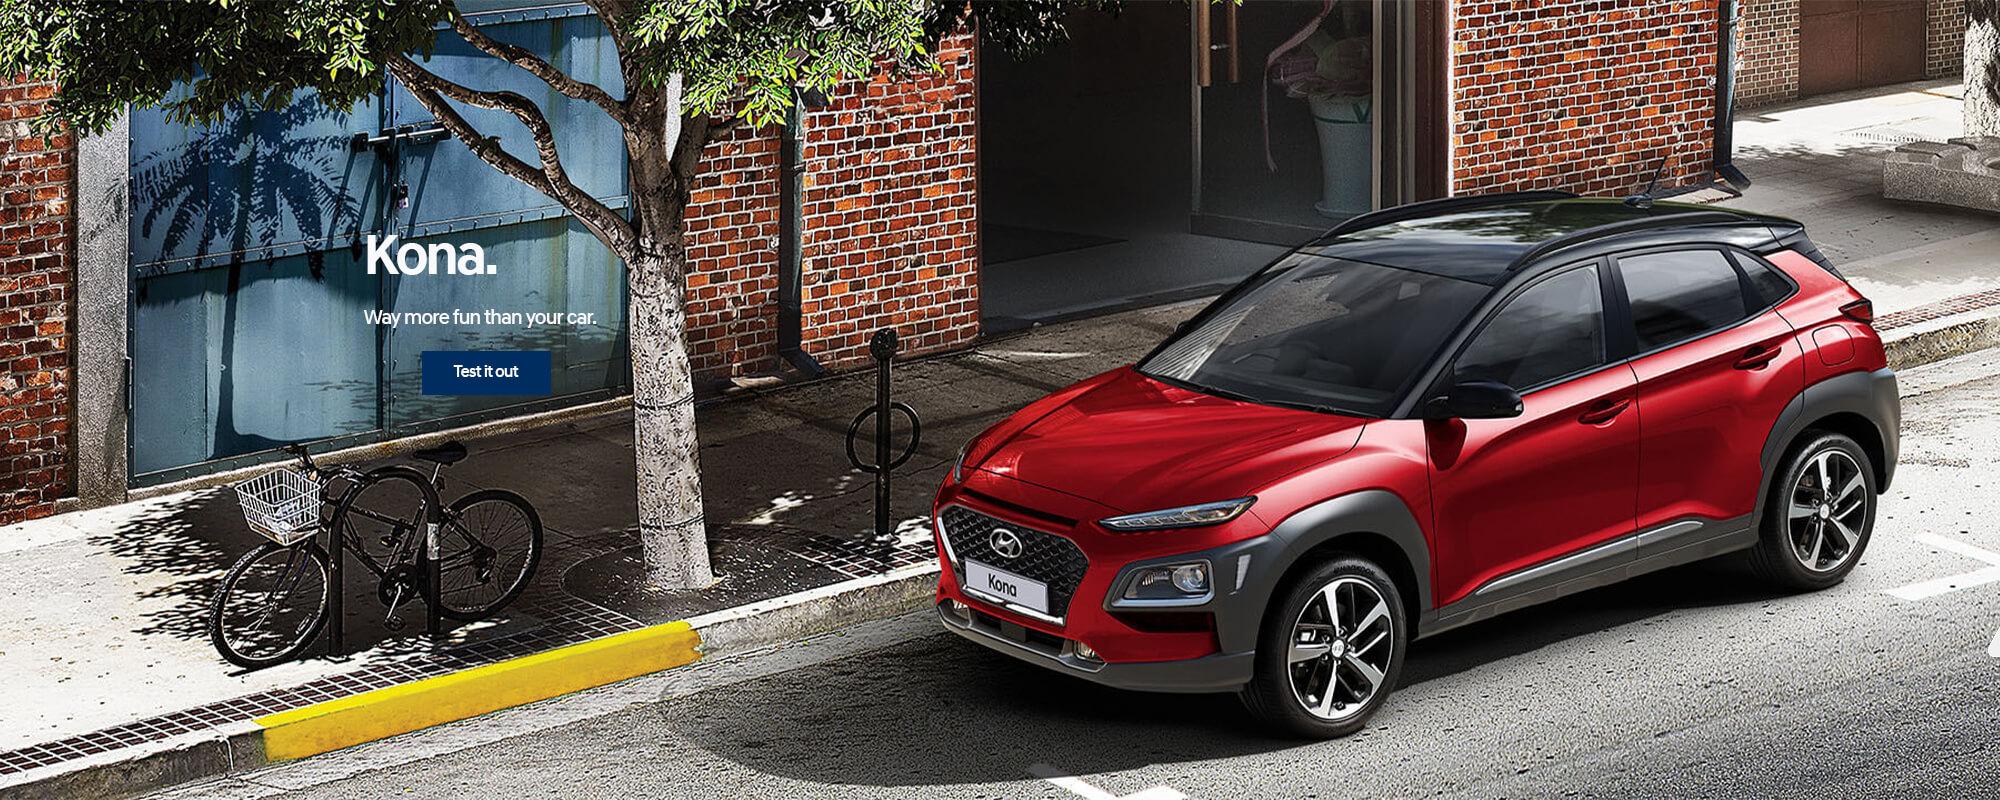 Hyundai Kona. Way more fun than your car. Book a test drive today.